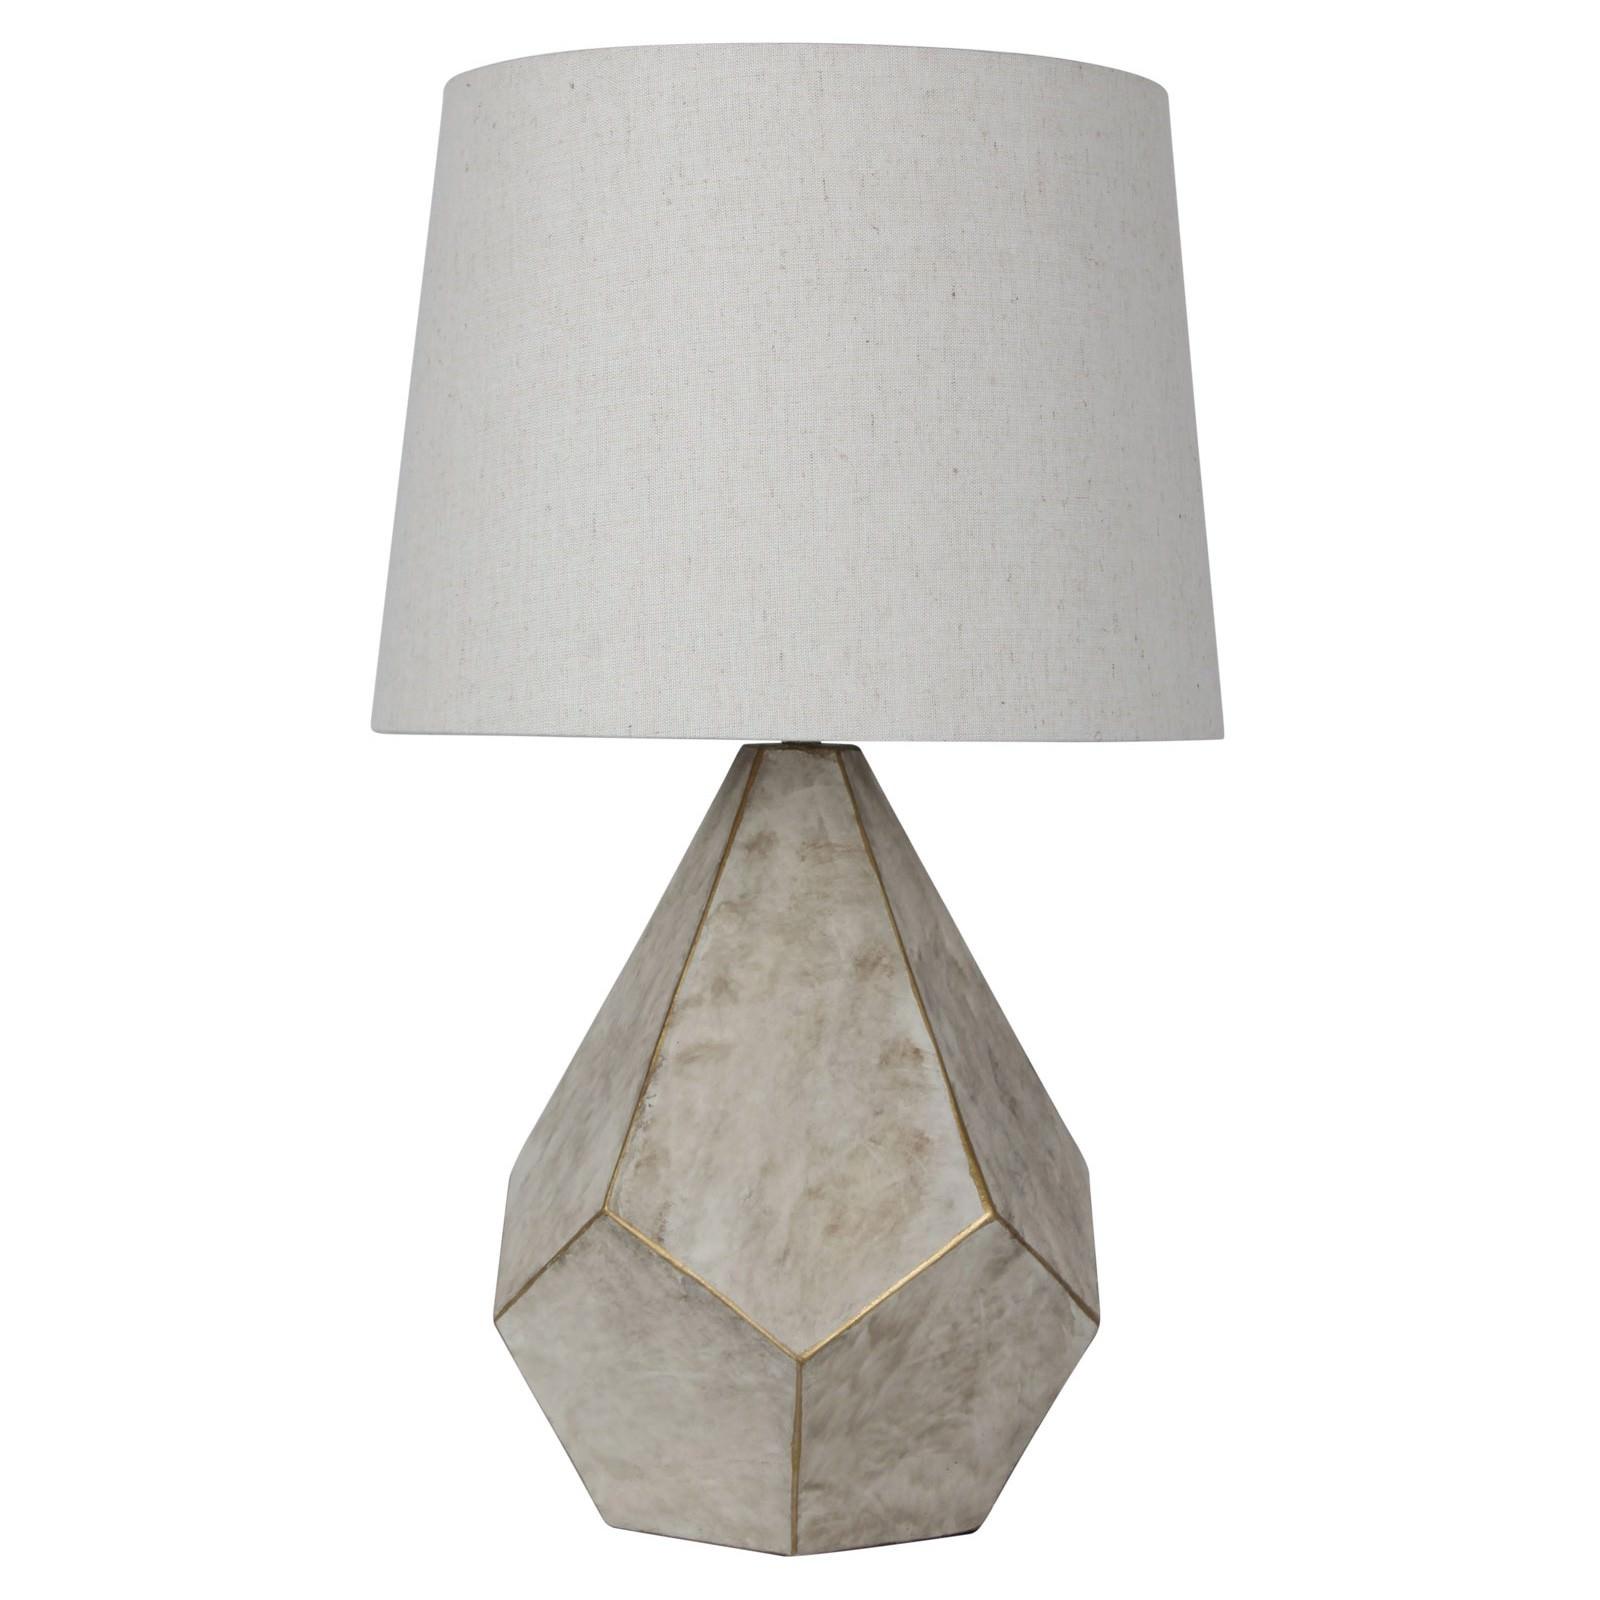 Leon Geometric Table Lamp